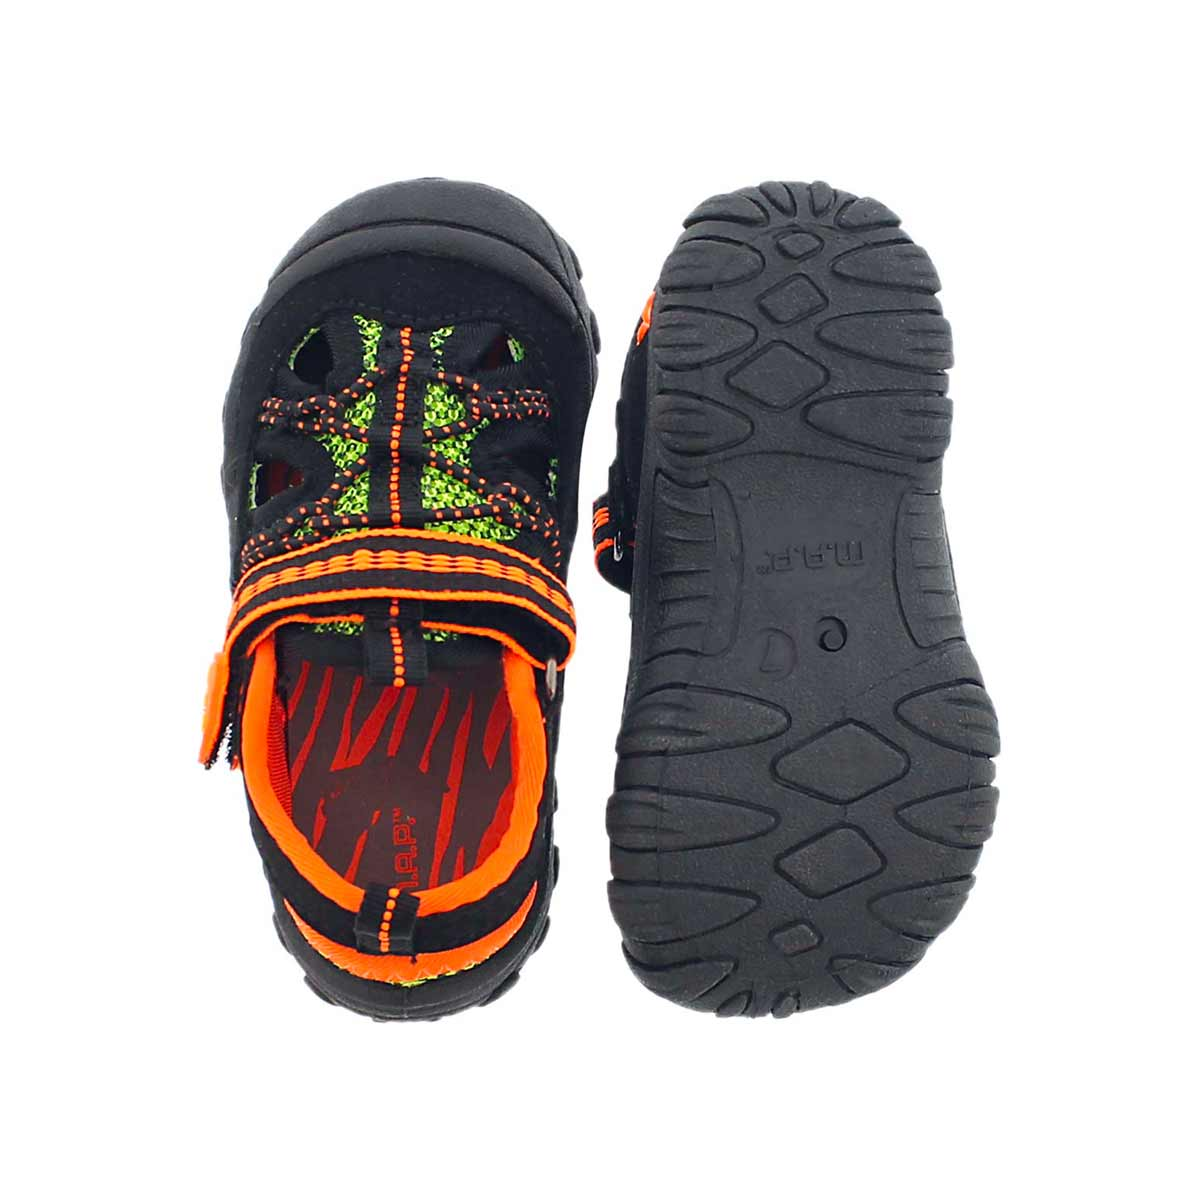 Sandale pêcheur EMMONS, noir/orange, béb